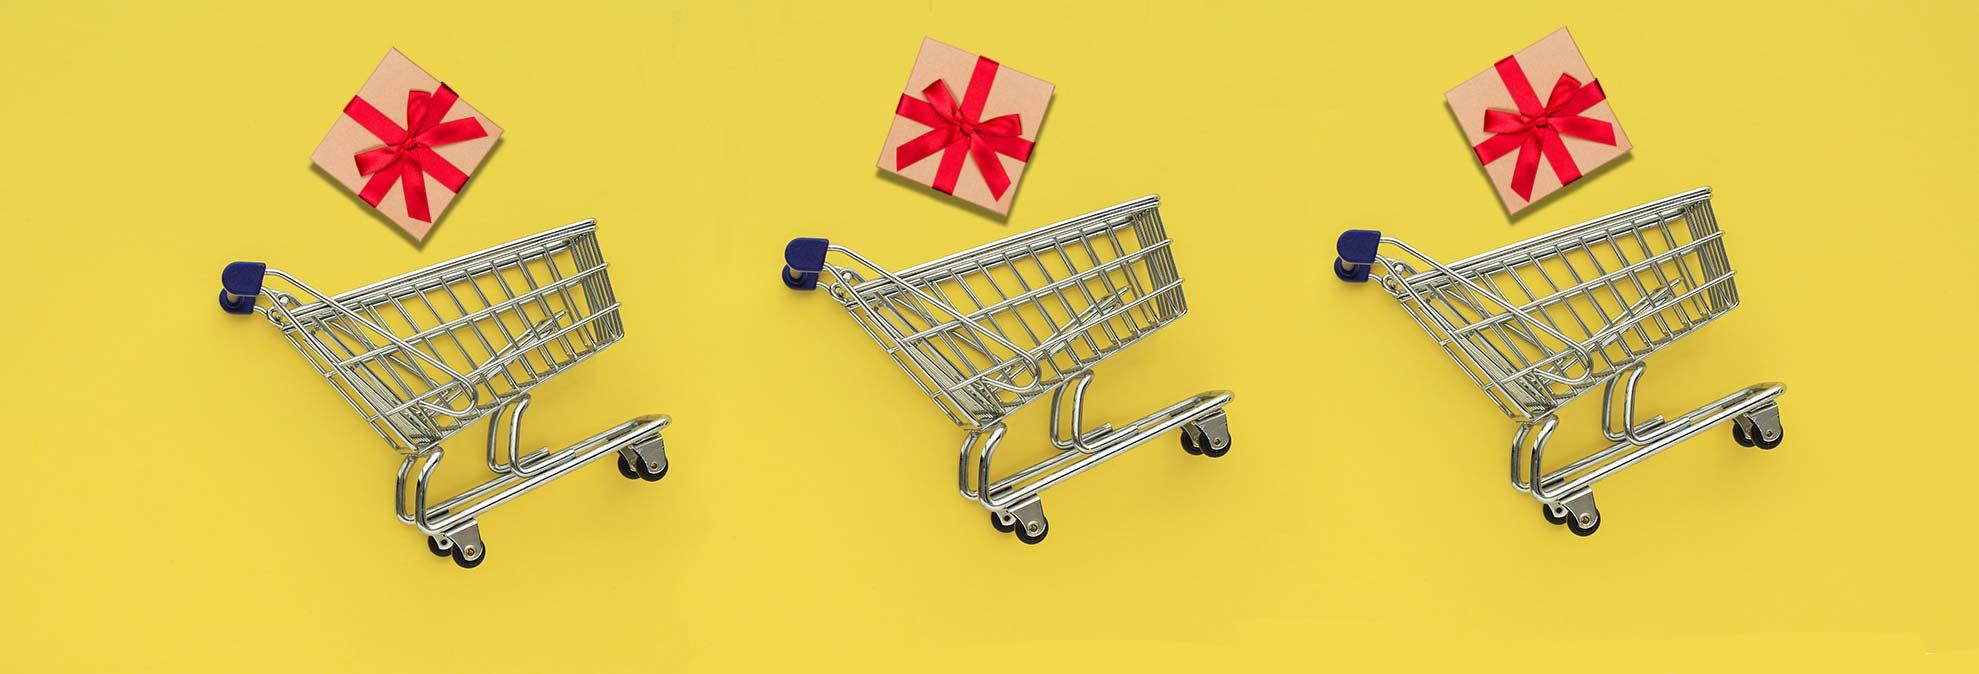 Best Black Friday Deals Under $100 - Consumer Reports